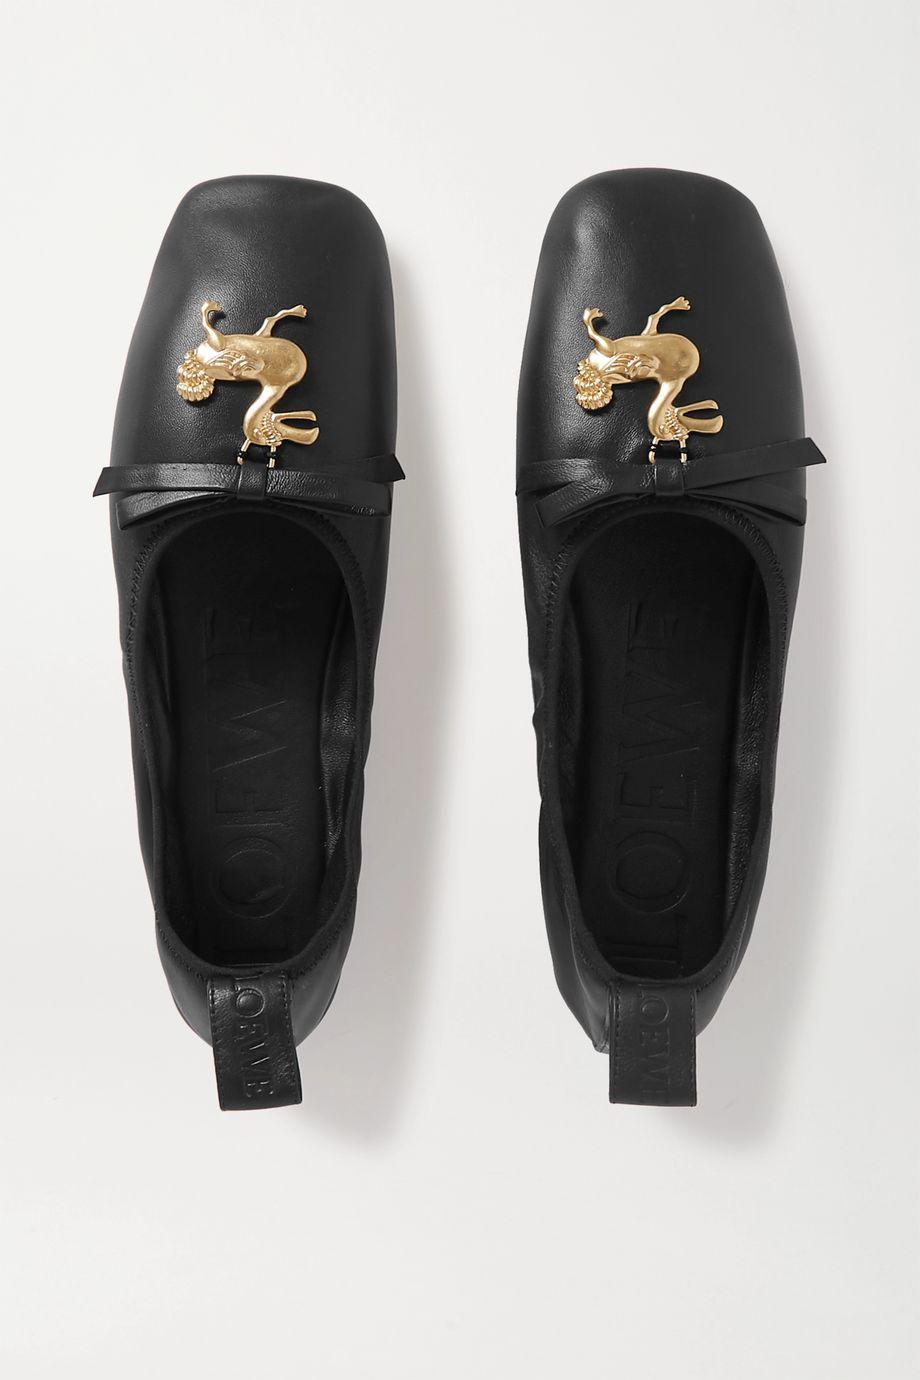 Loewe Embellished leather ballet flats